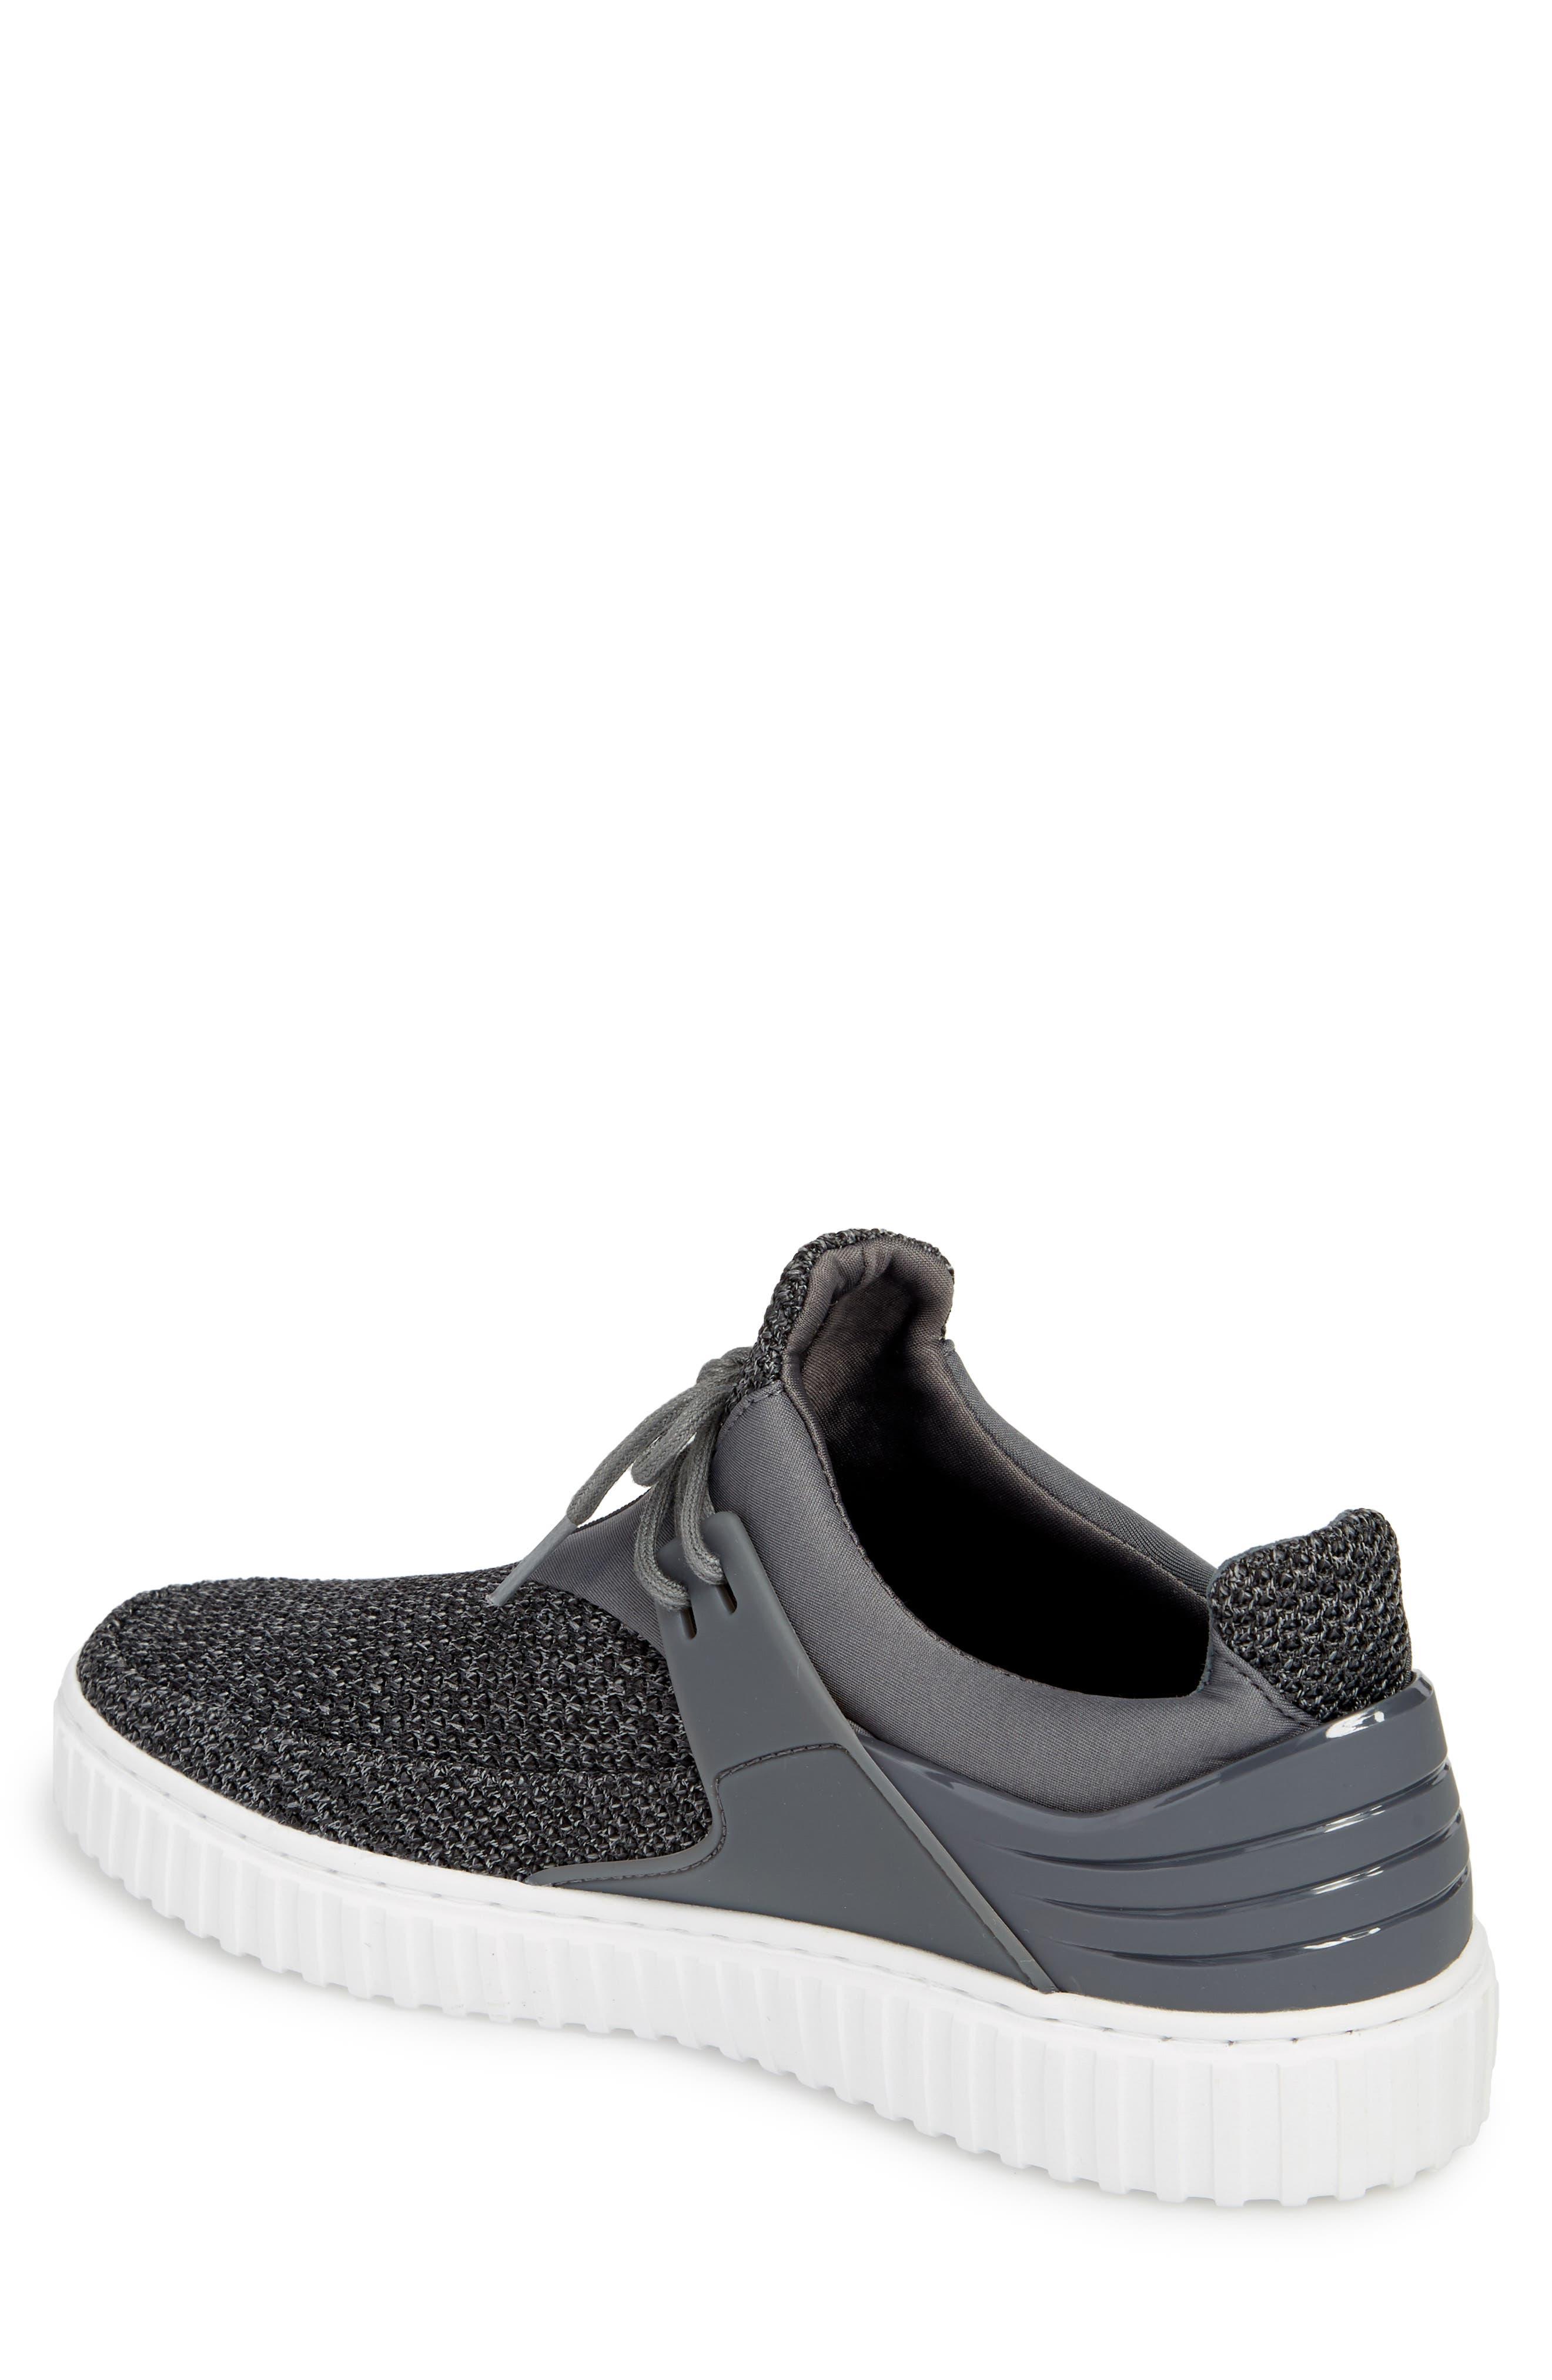 Castucci Knit Sneaker,                             Alternate thumbnail 2, color,                             021